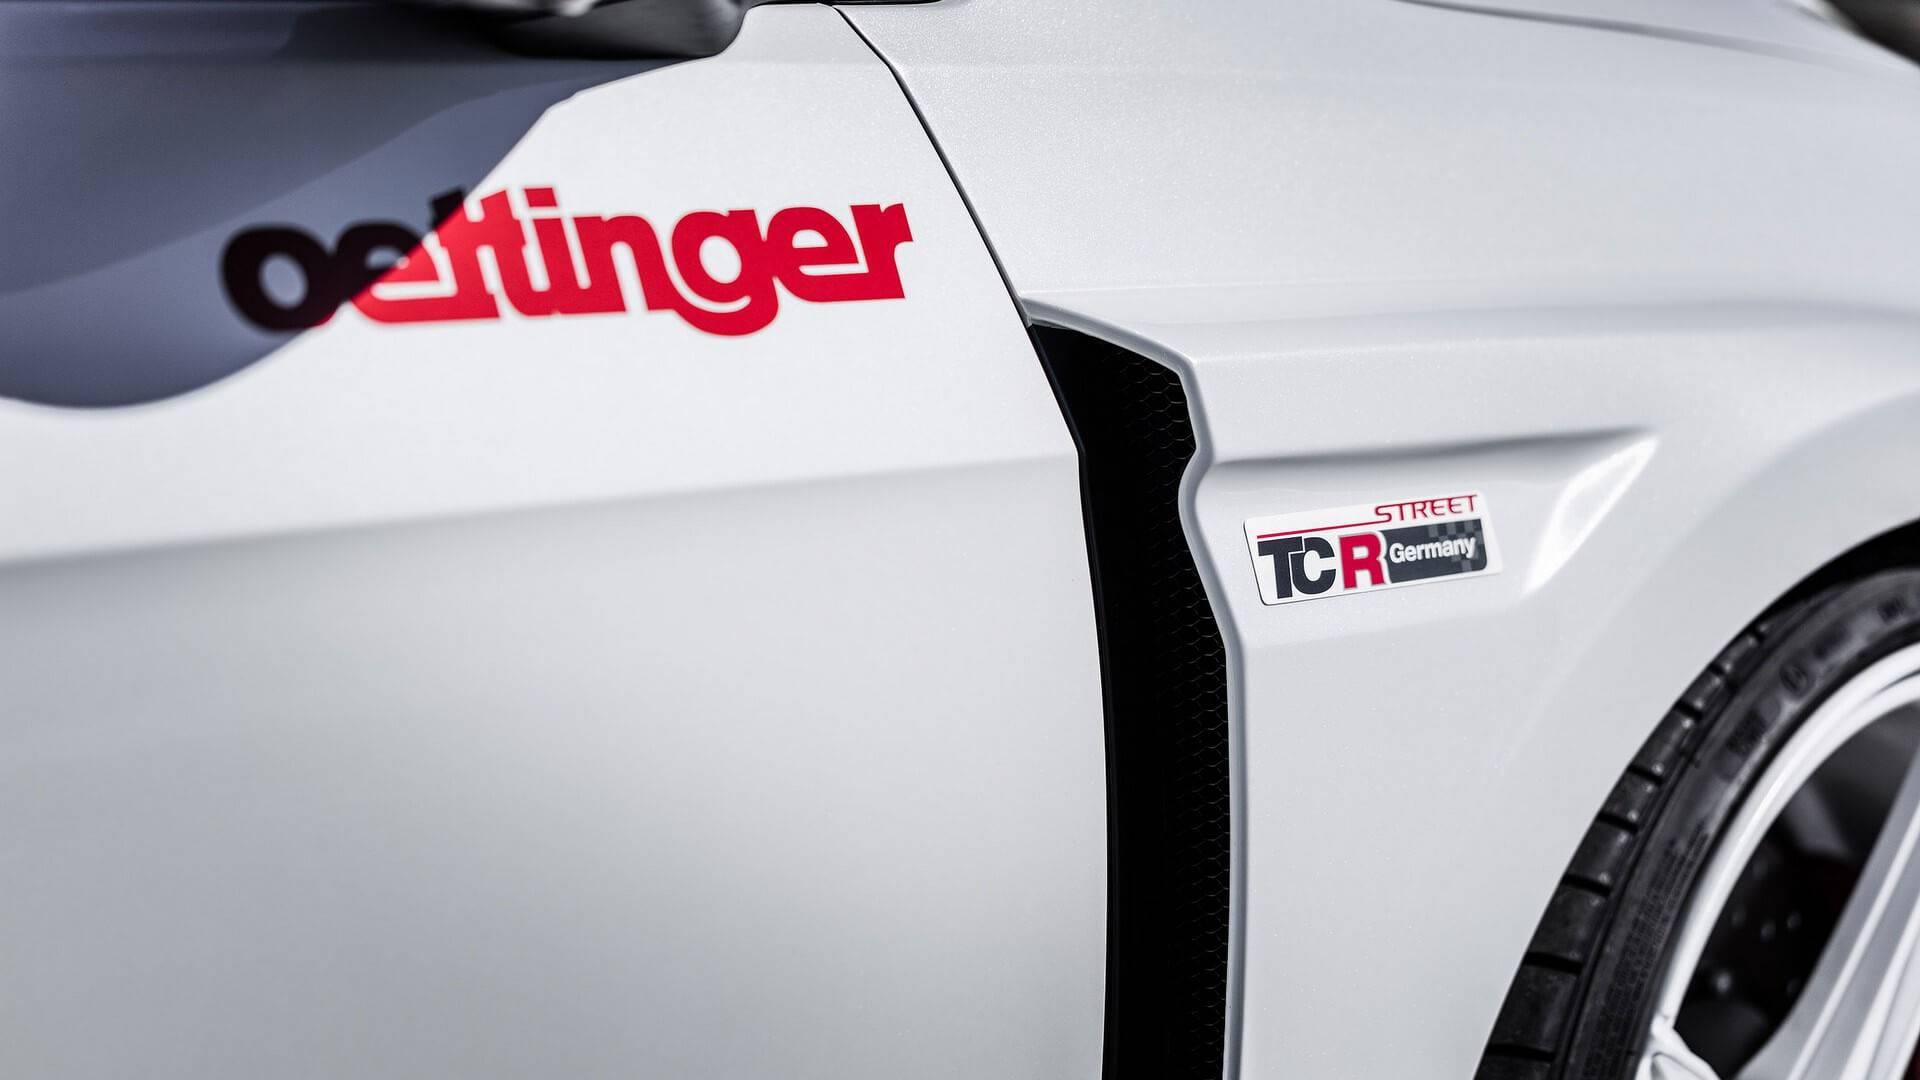 VW_Golf_GTI_Oettinger_TCR_Germany_Street_0005